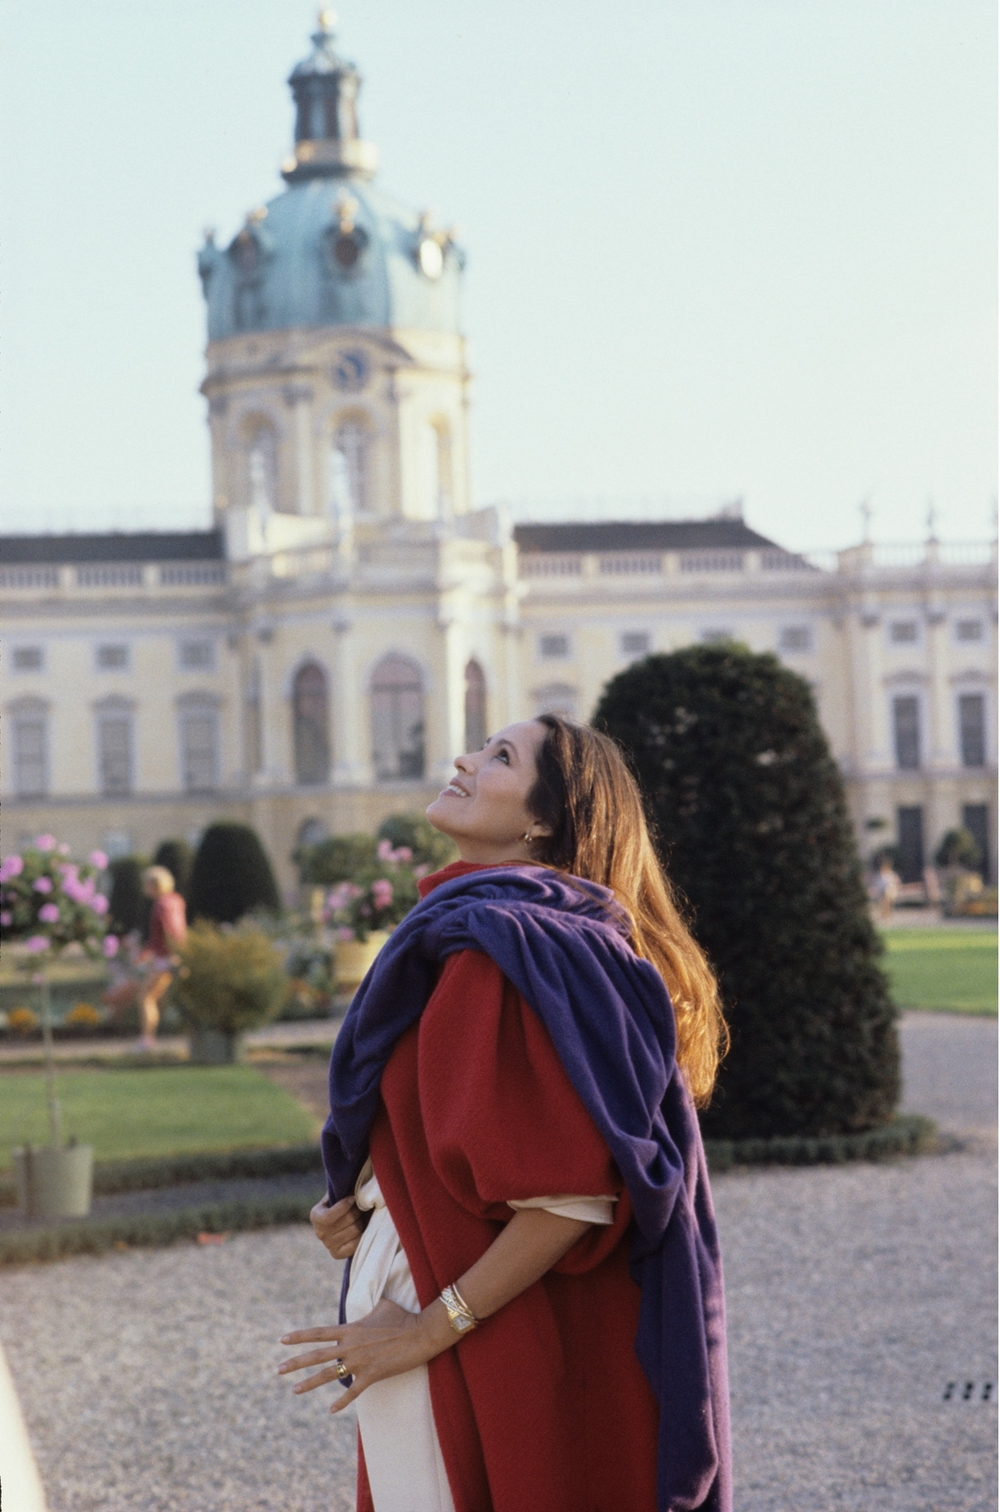 Barbara Carrera  - Charlottenburg Palace, Berlin